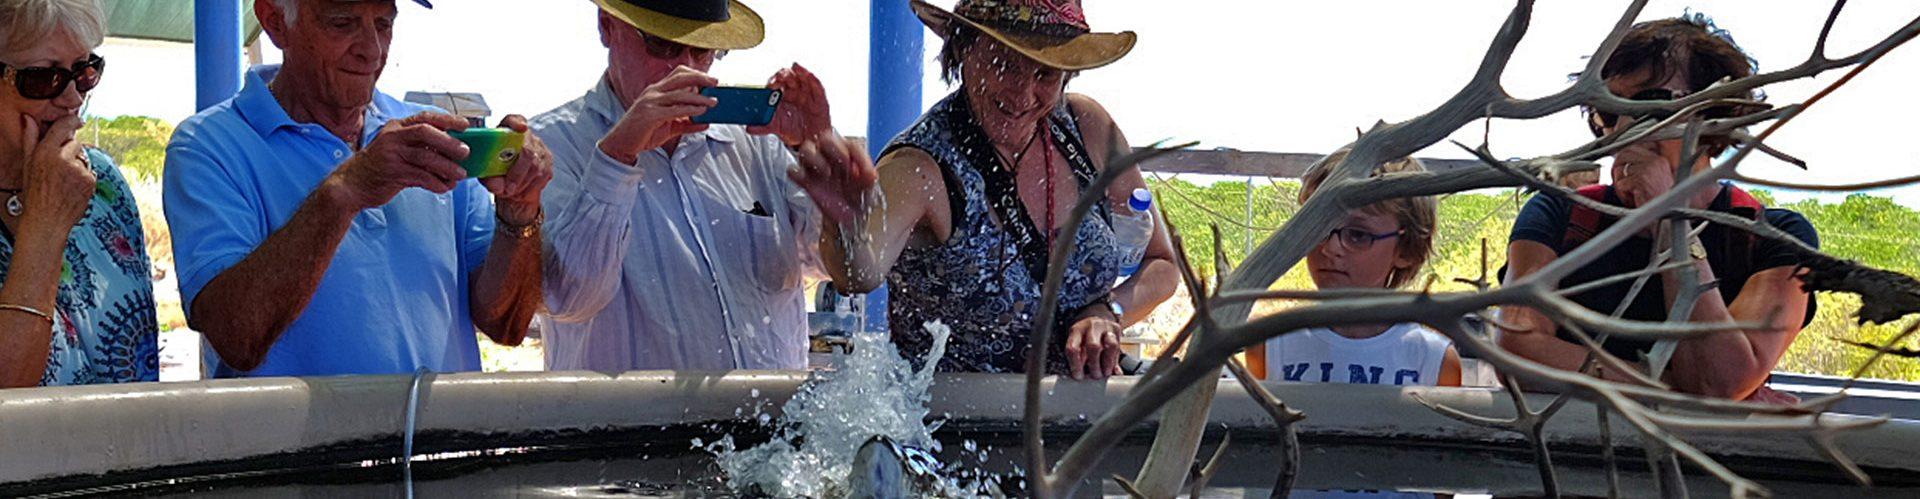 One Arm Point Dampier Peninsula Aquaculture Hatchery